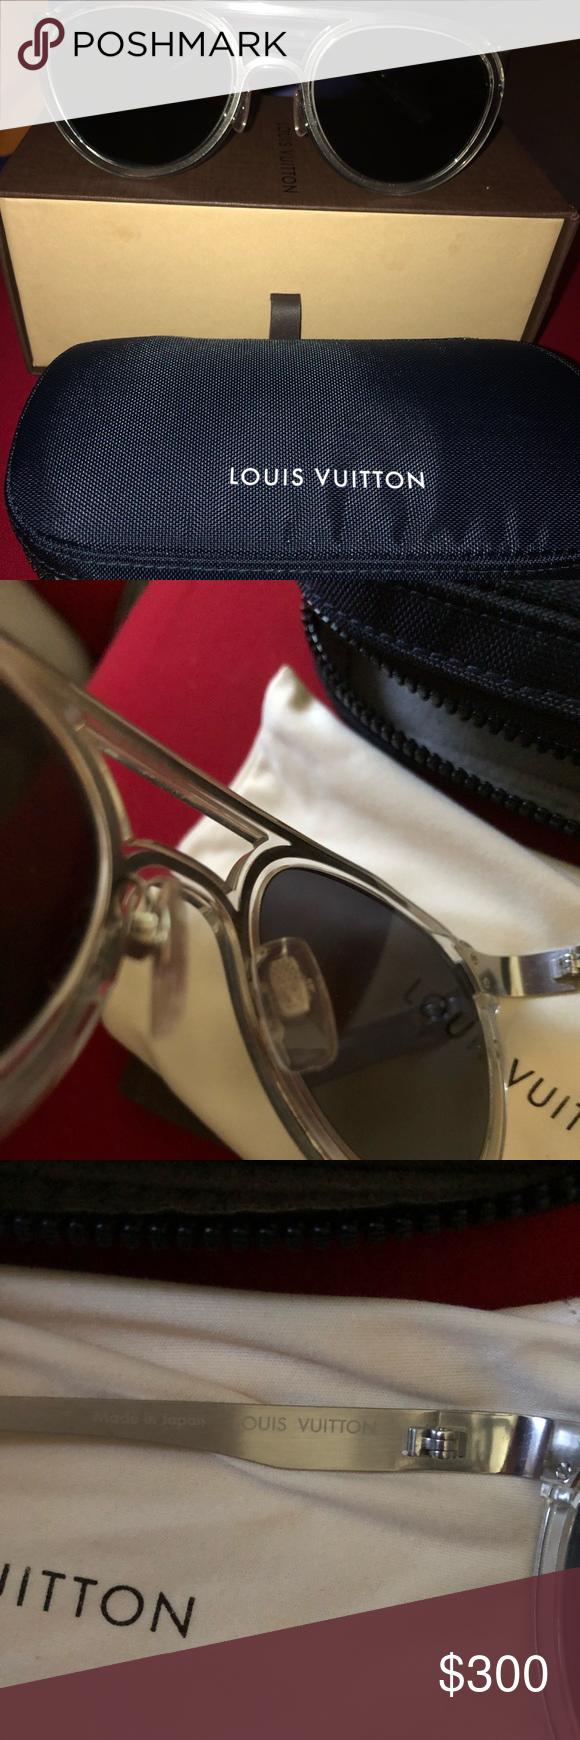 03e730dc05eb Louis Vuitton Mens Small Aviator Sunglasses Small Aviator Mens sunglasses